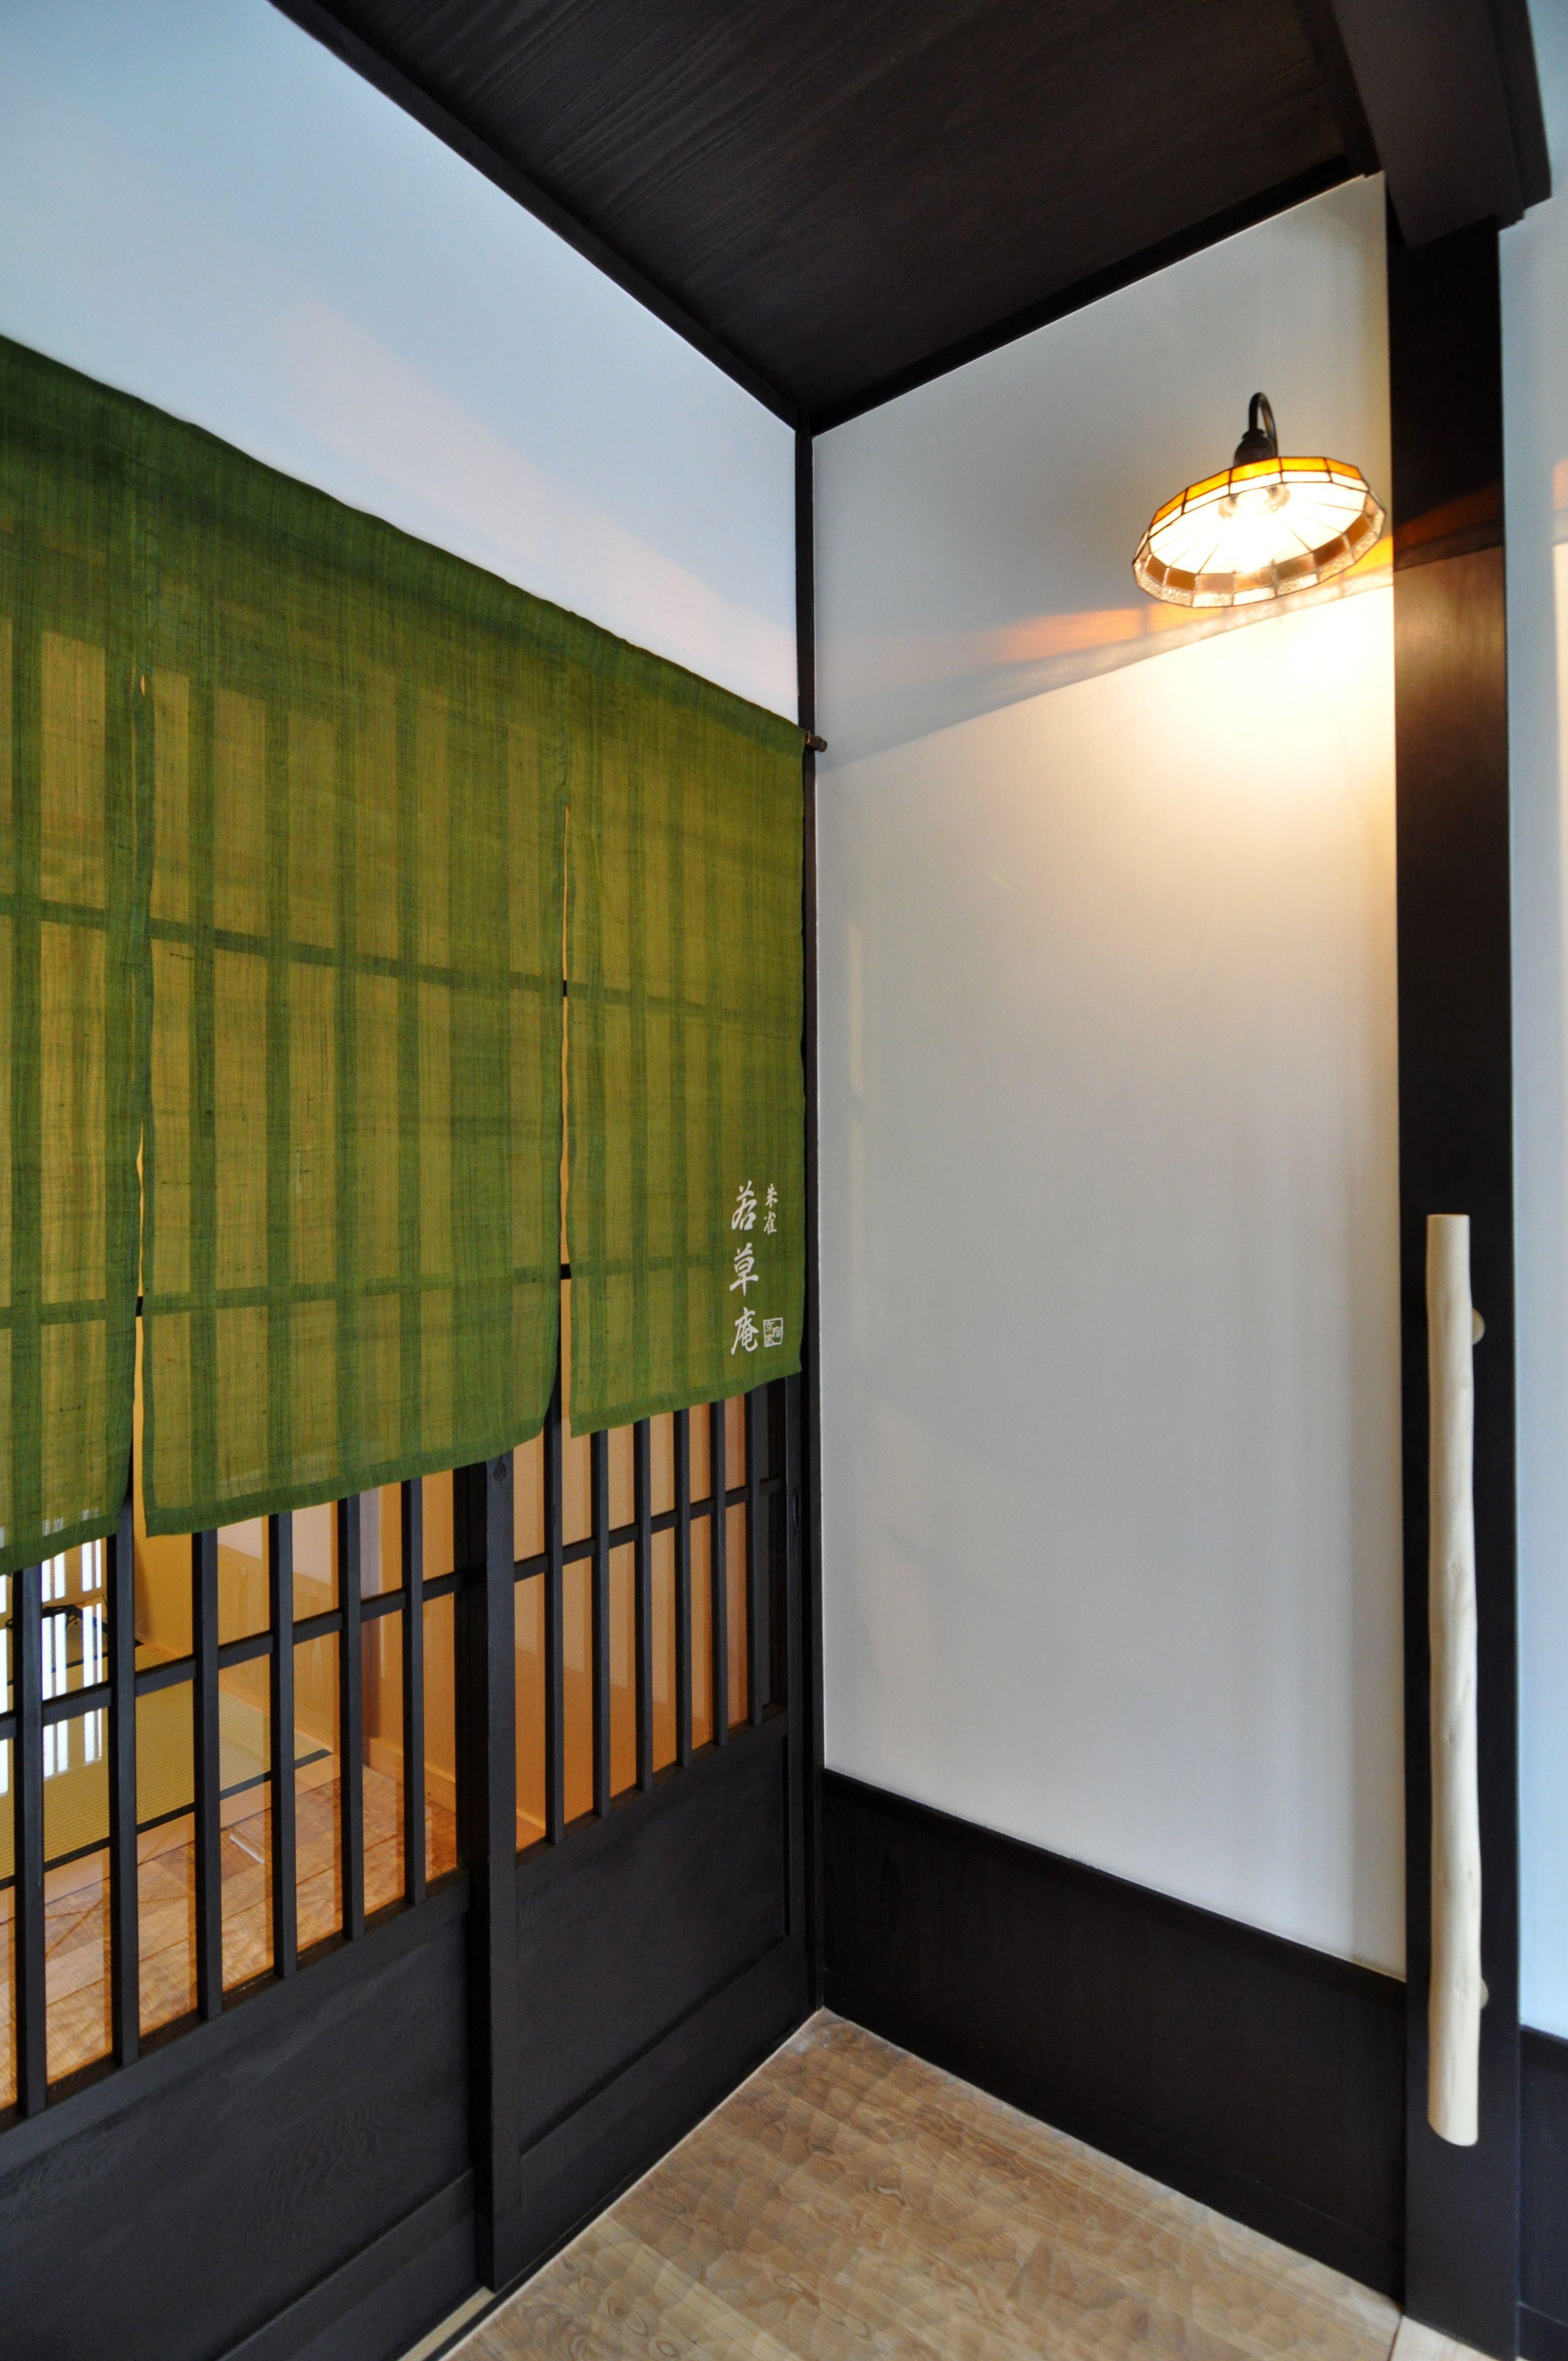 京都の伝統家屋 町家の貸切の宿 朱雀若草庵 玄関 Kyoyadoya Japan